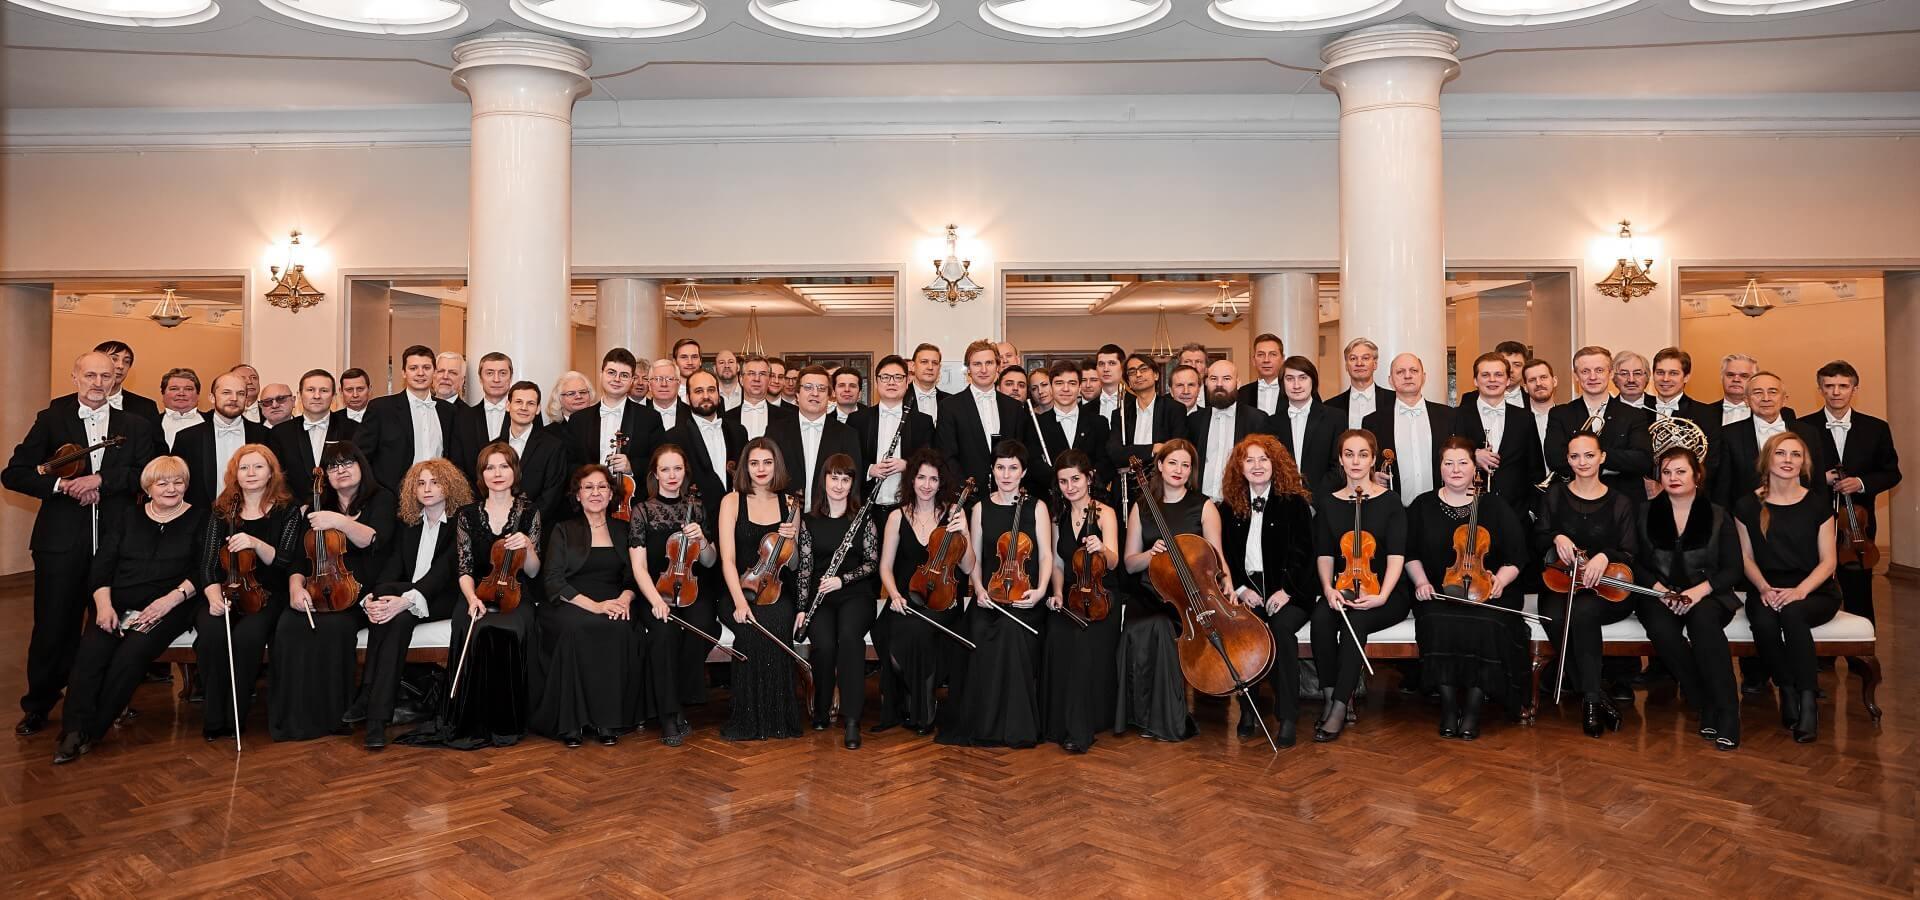 Russisch Nationaal Orkest - Glazoenov & Saint-Saëns